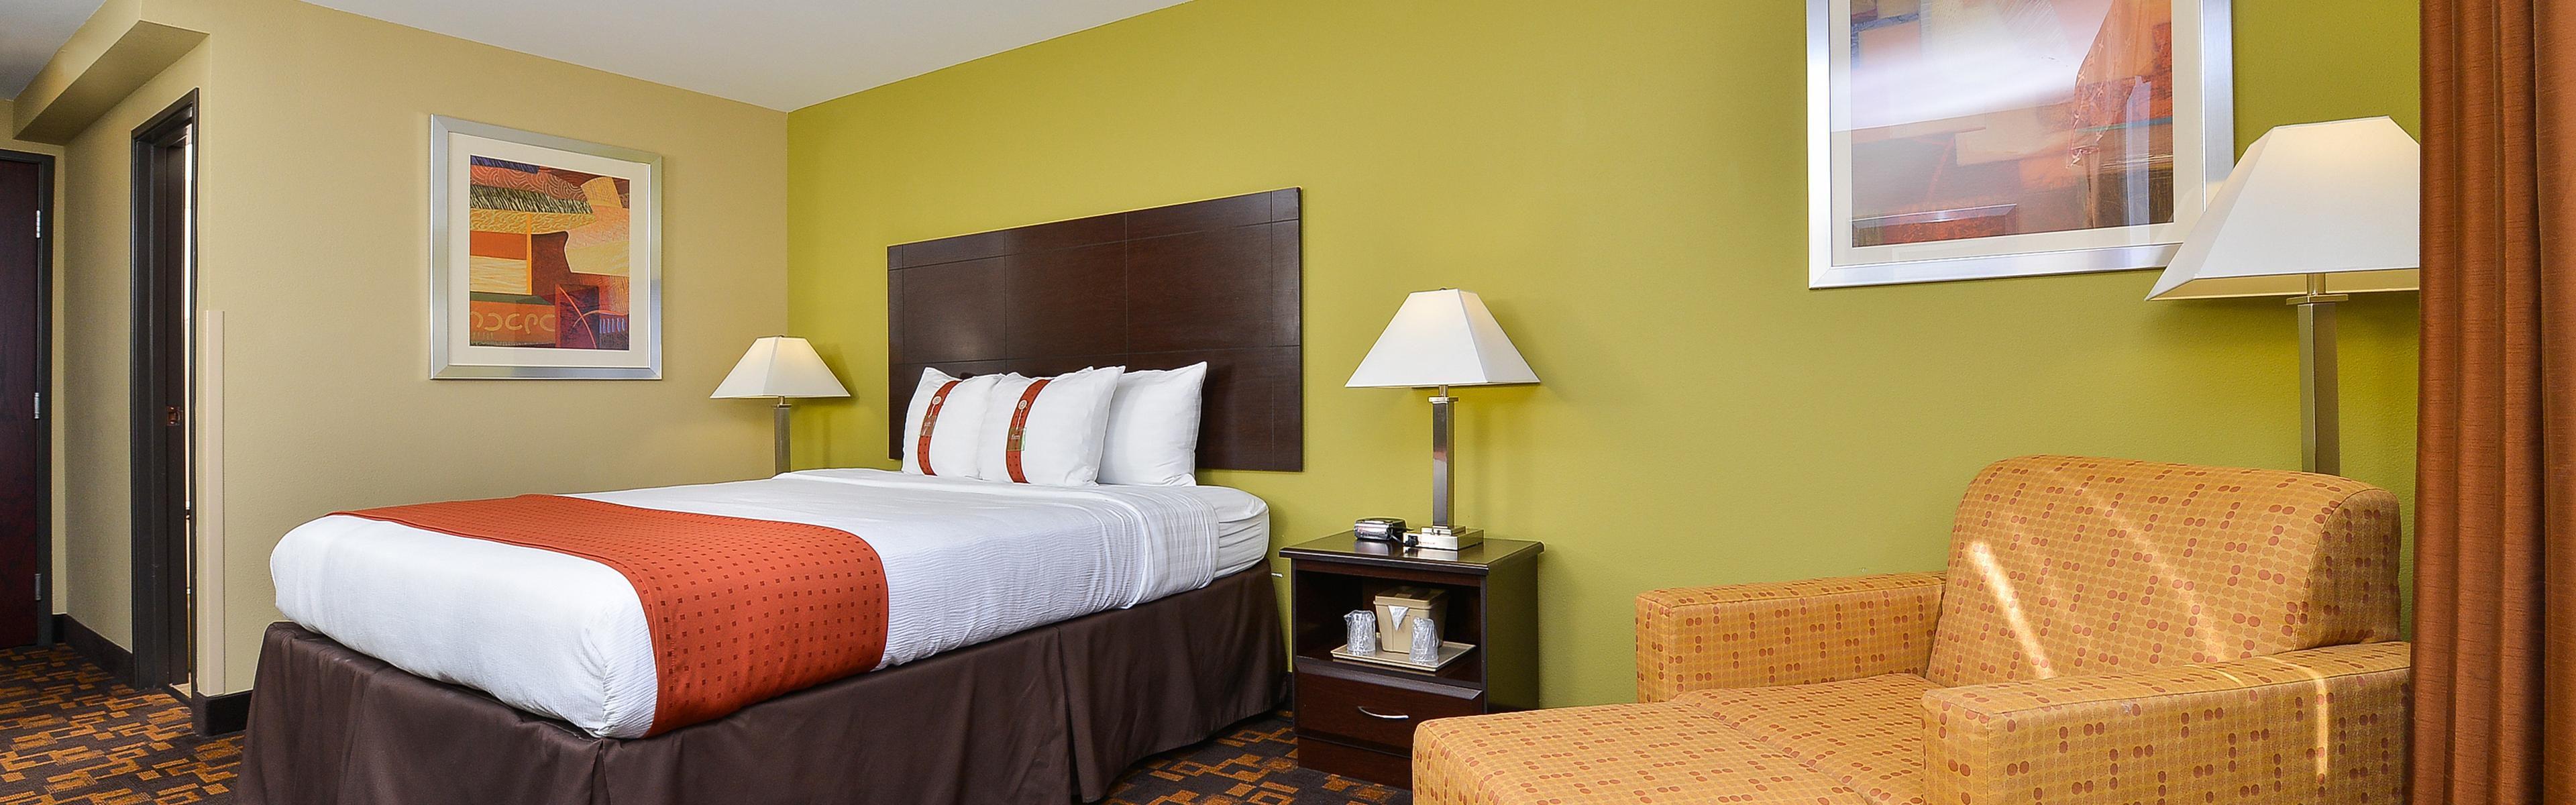 Holiday Inn Mount Prospect - Chicago image 1